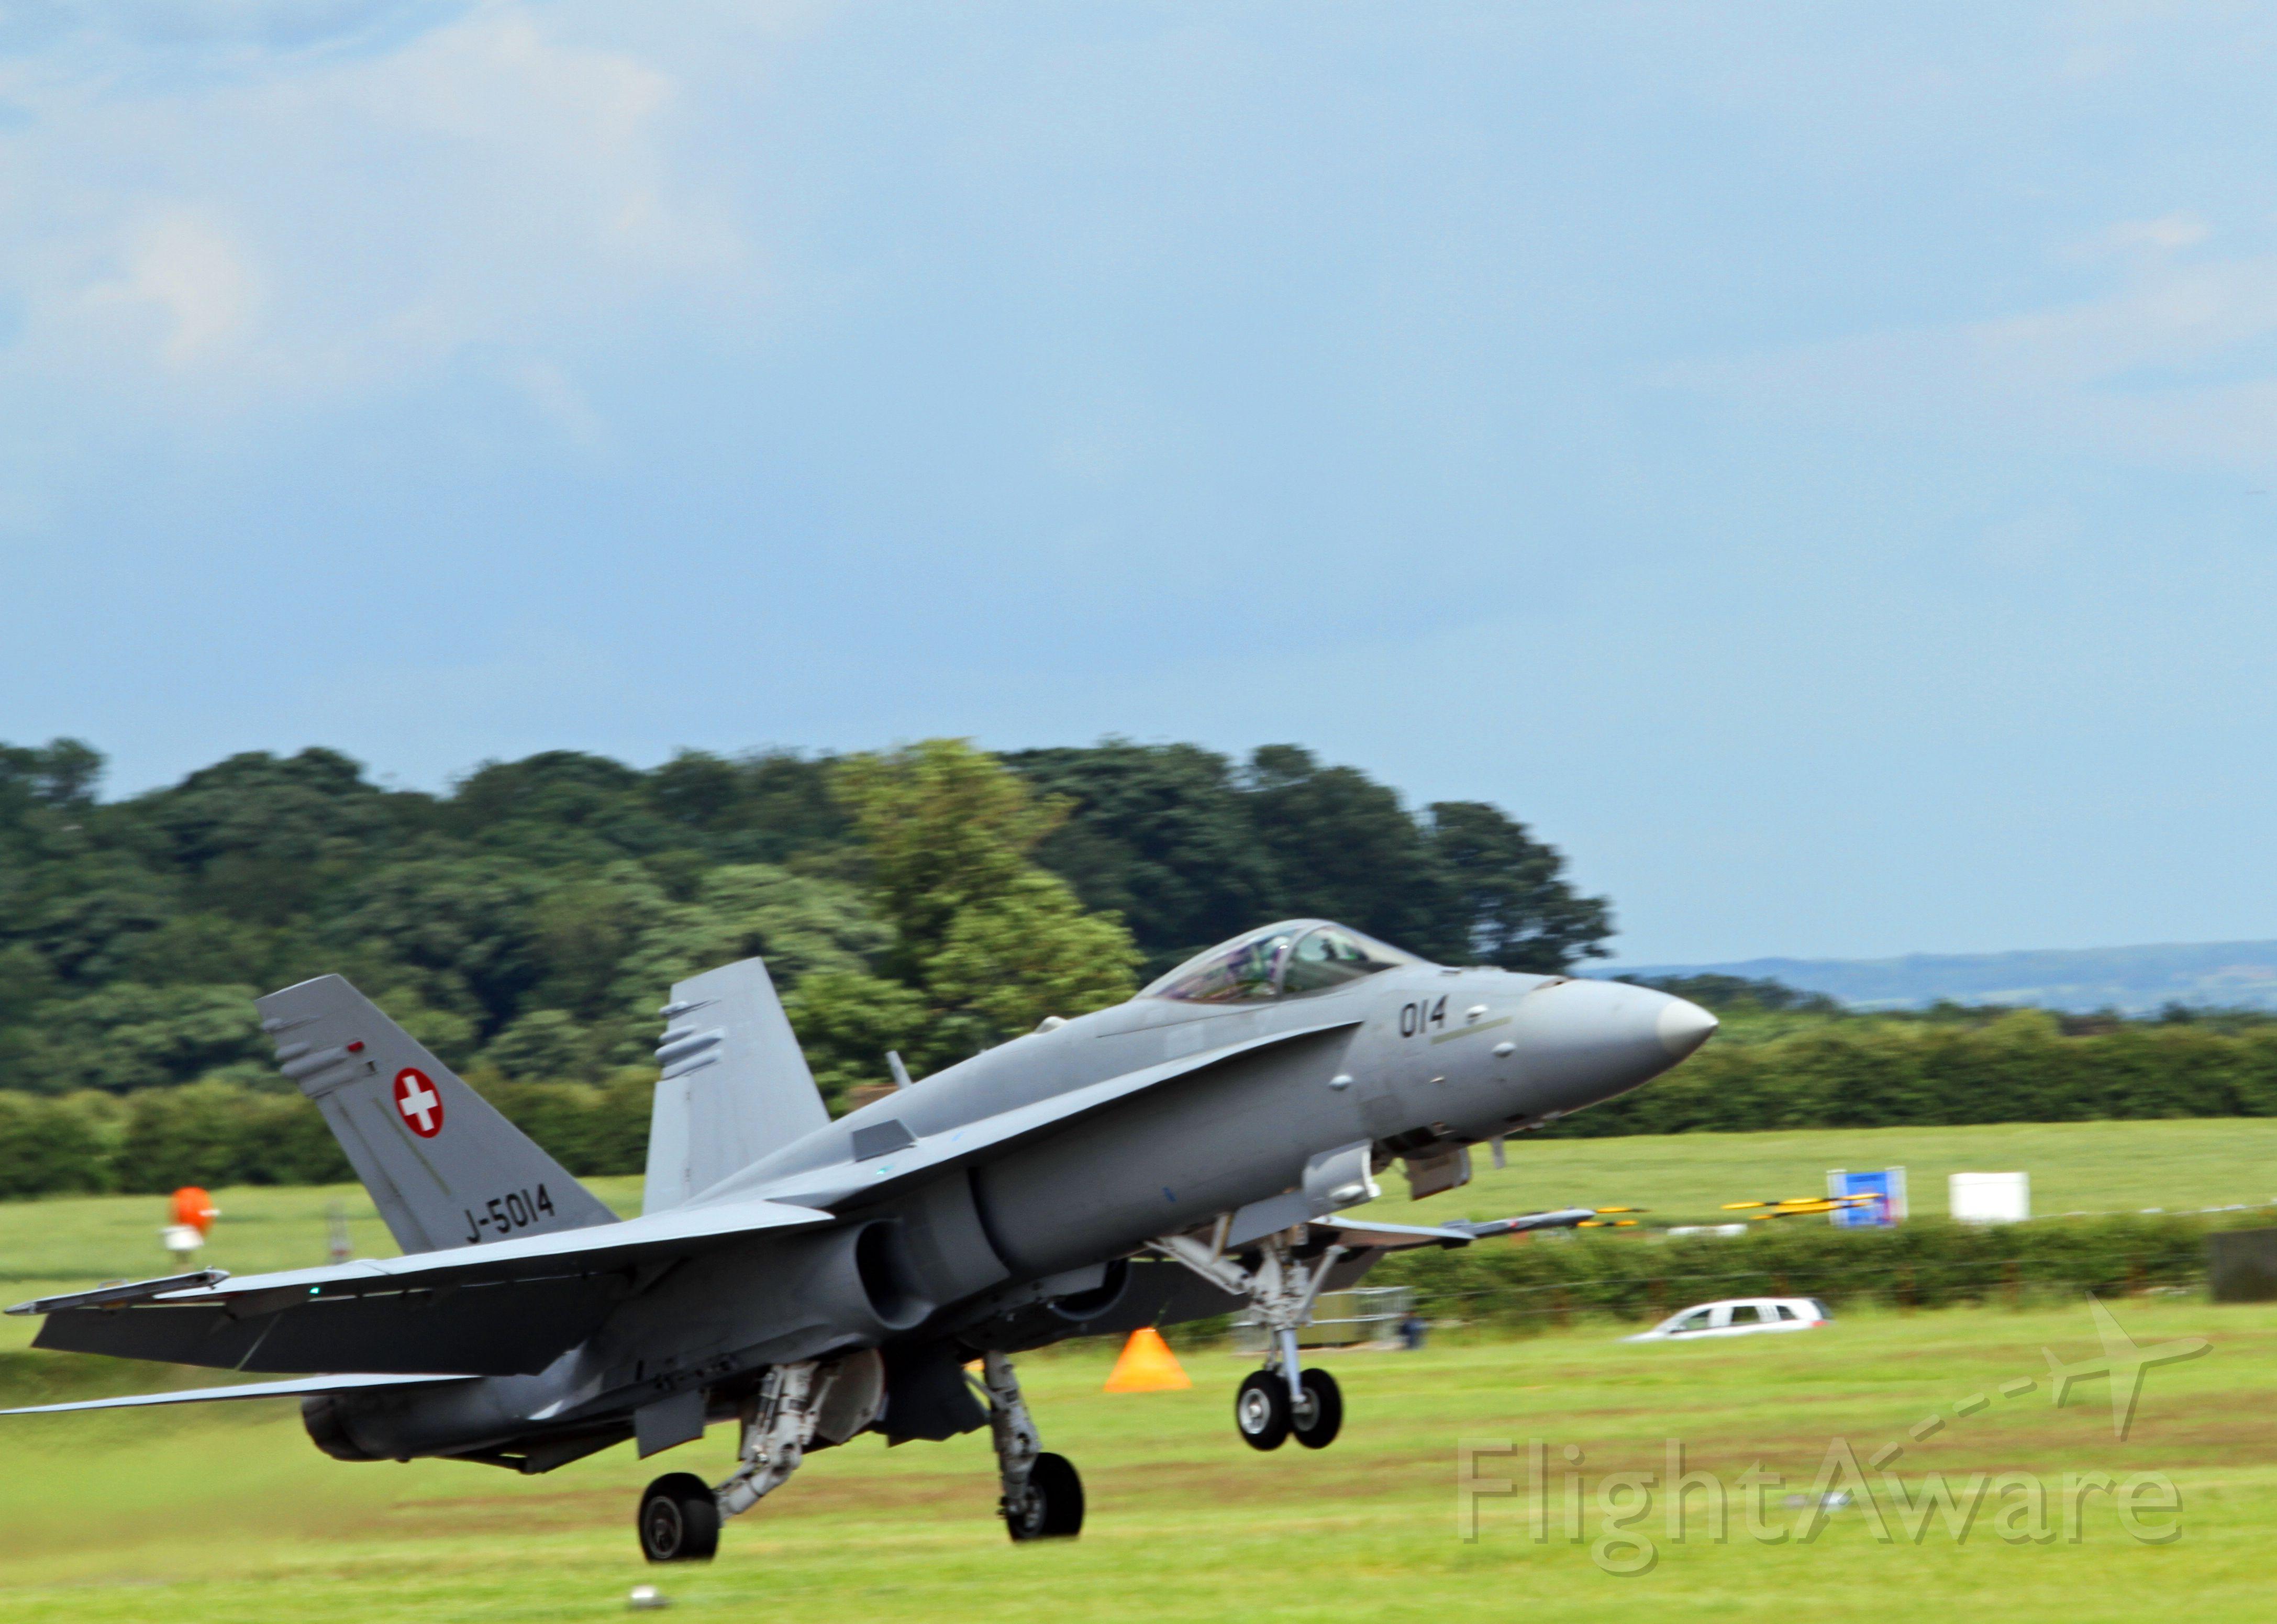 McDonnell Douglas FA-18 Hornet (J5014) - Dunsfold air show 2012